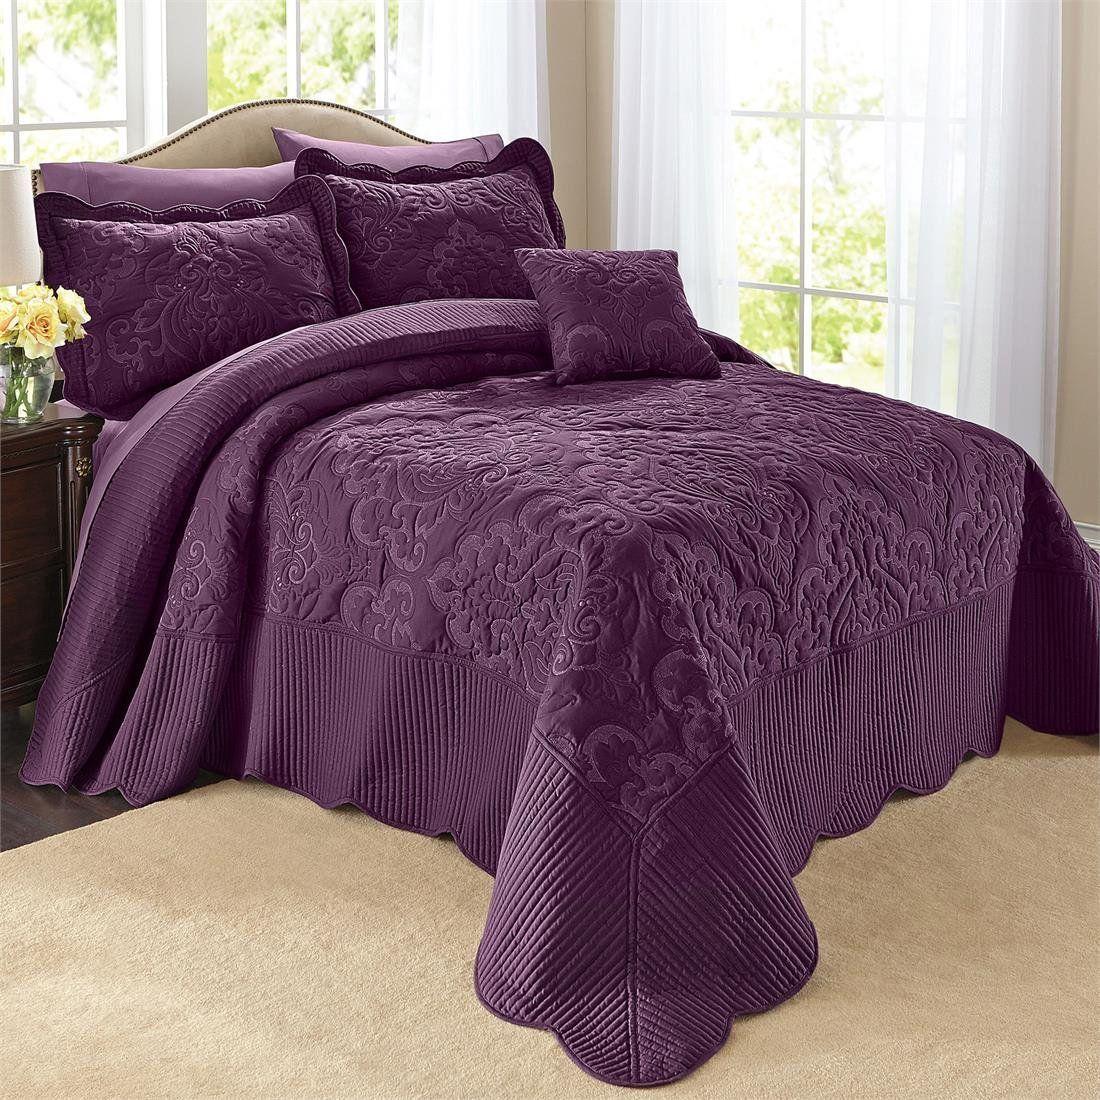 covers bedroom duvet mauve comforter ideas pink plum size queen duvets city scene and grey double quality sets eggplant set cover raindance king red mini purple colored bedding